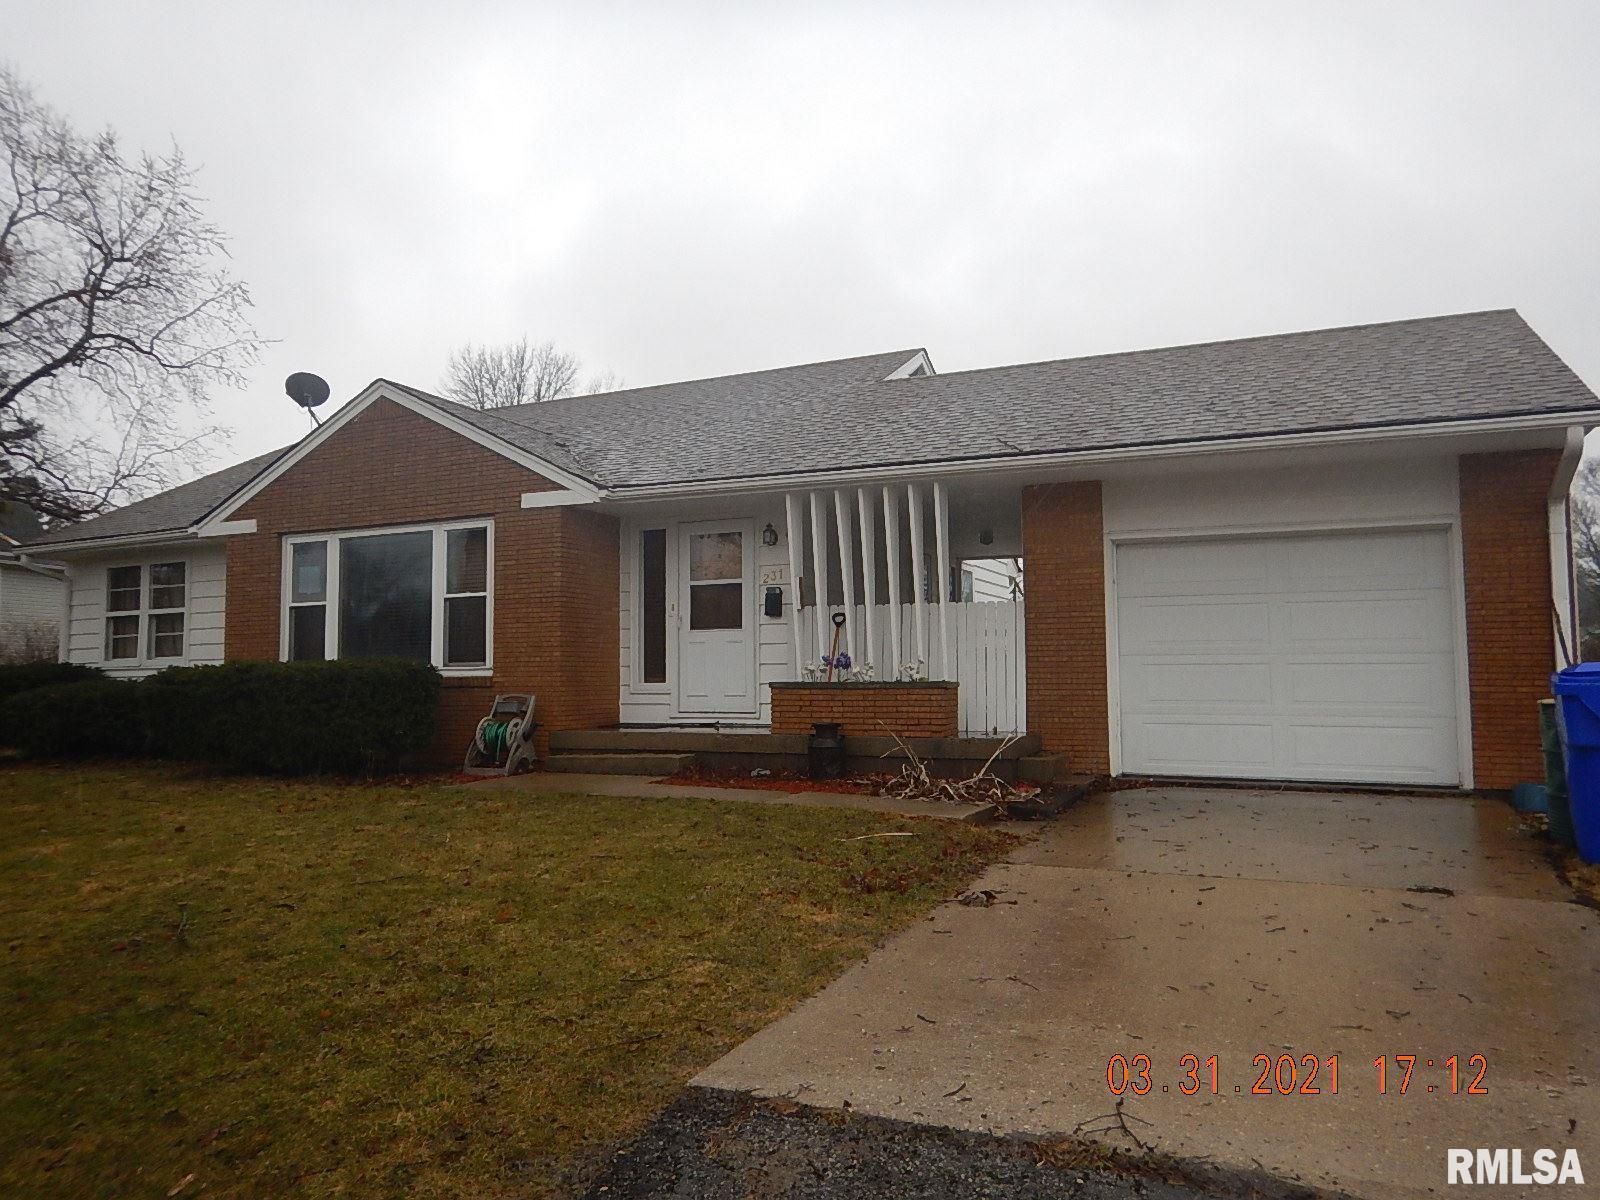 231 EDWARDS Property Photo - Kewanee, IL real estate listing